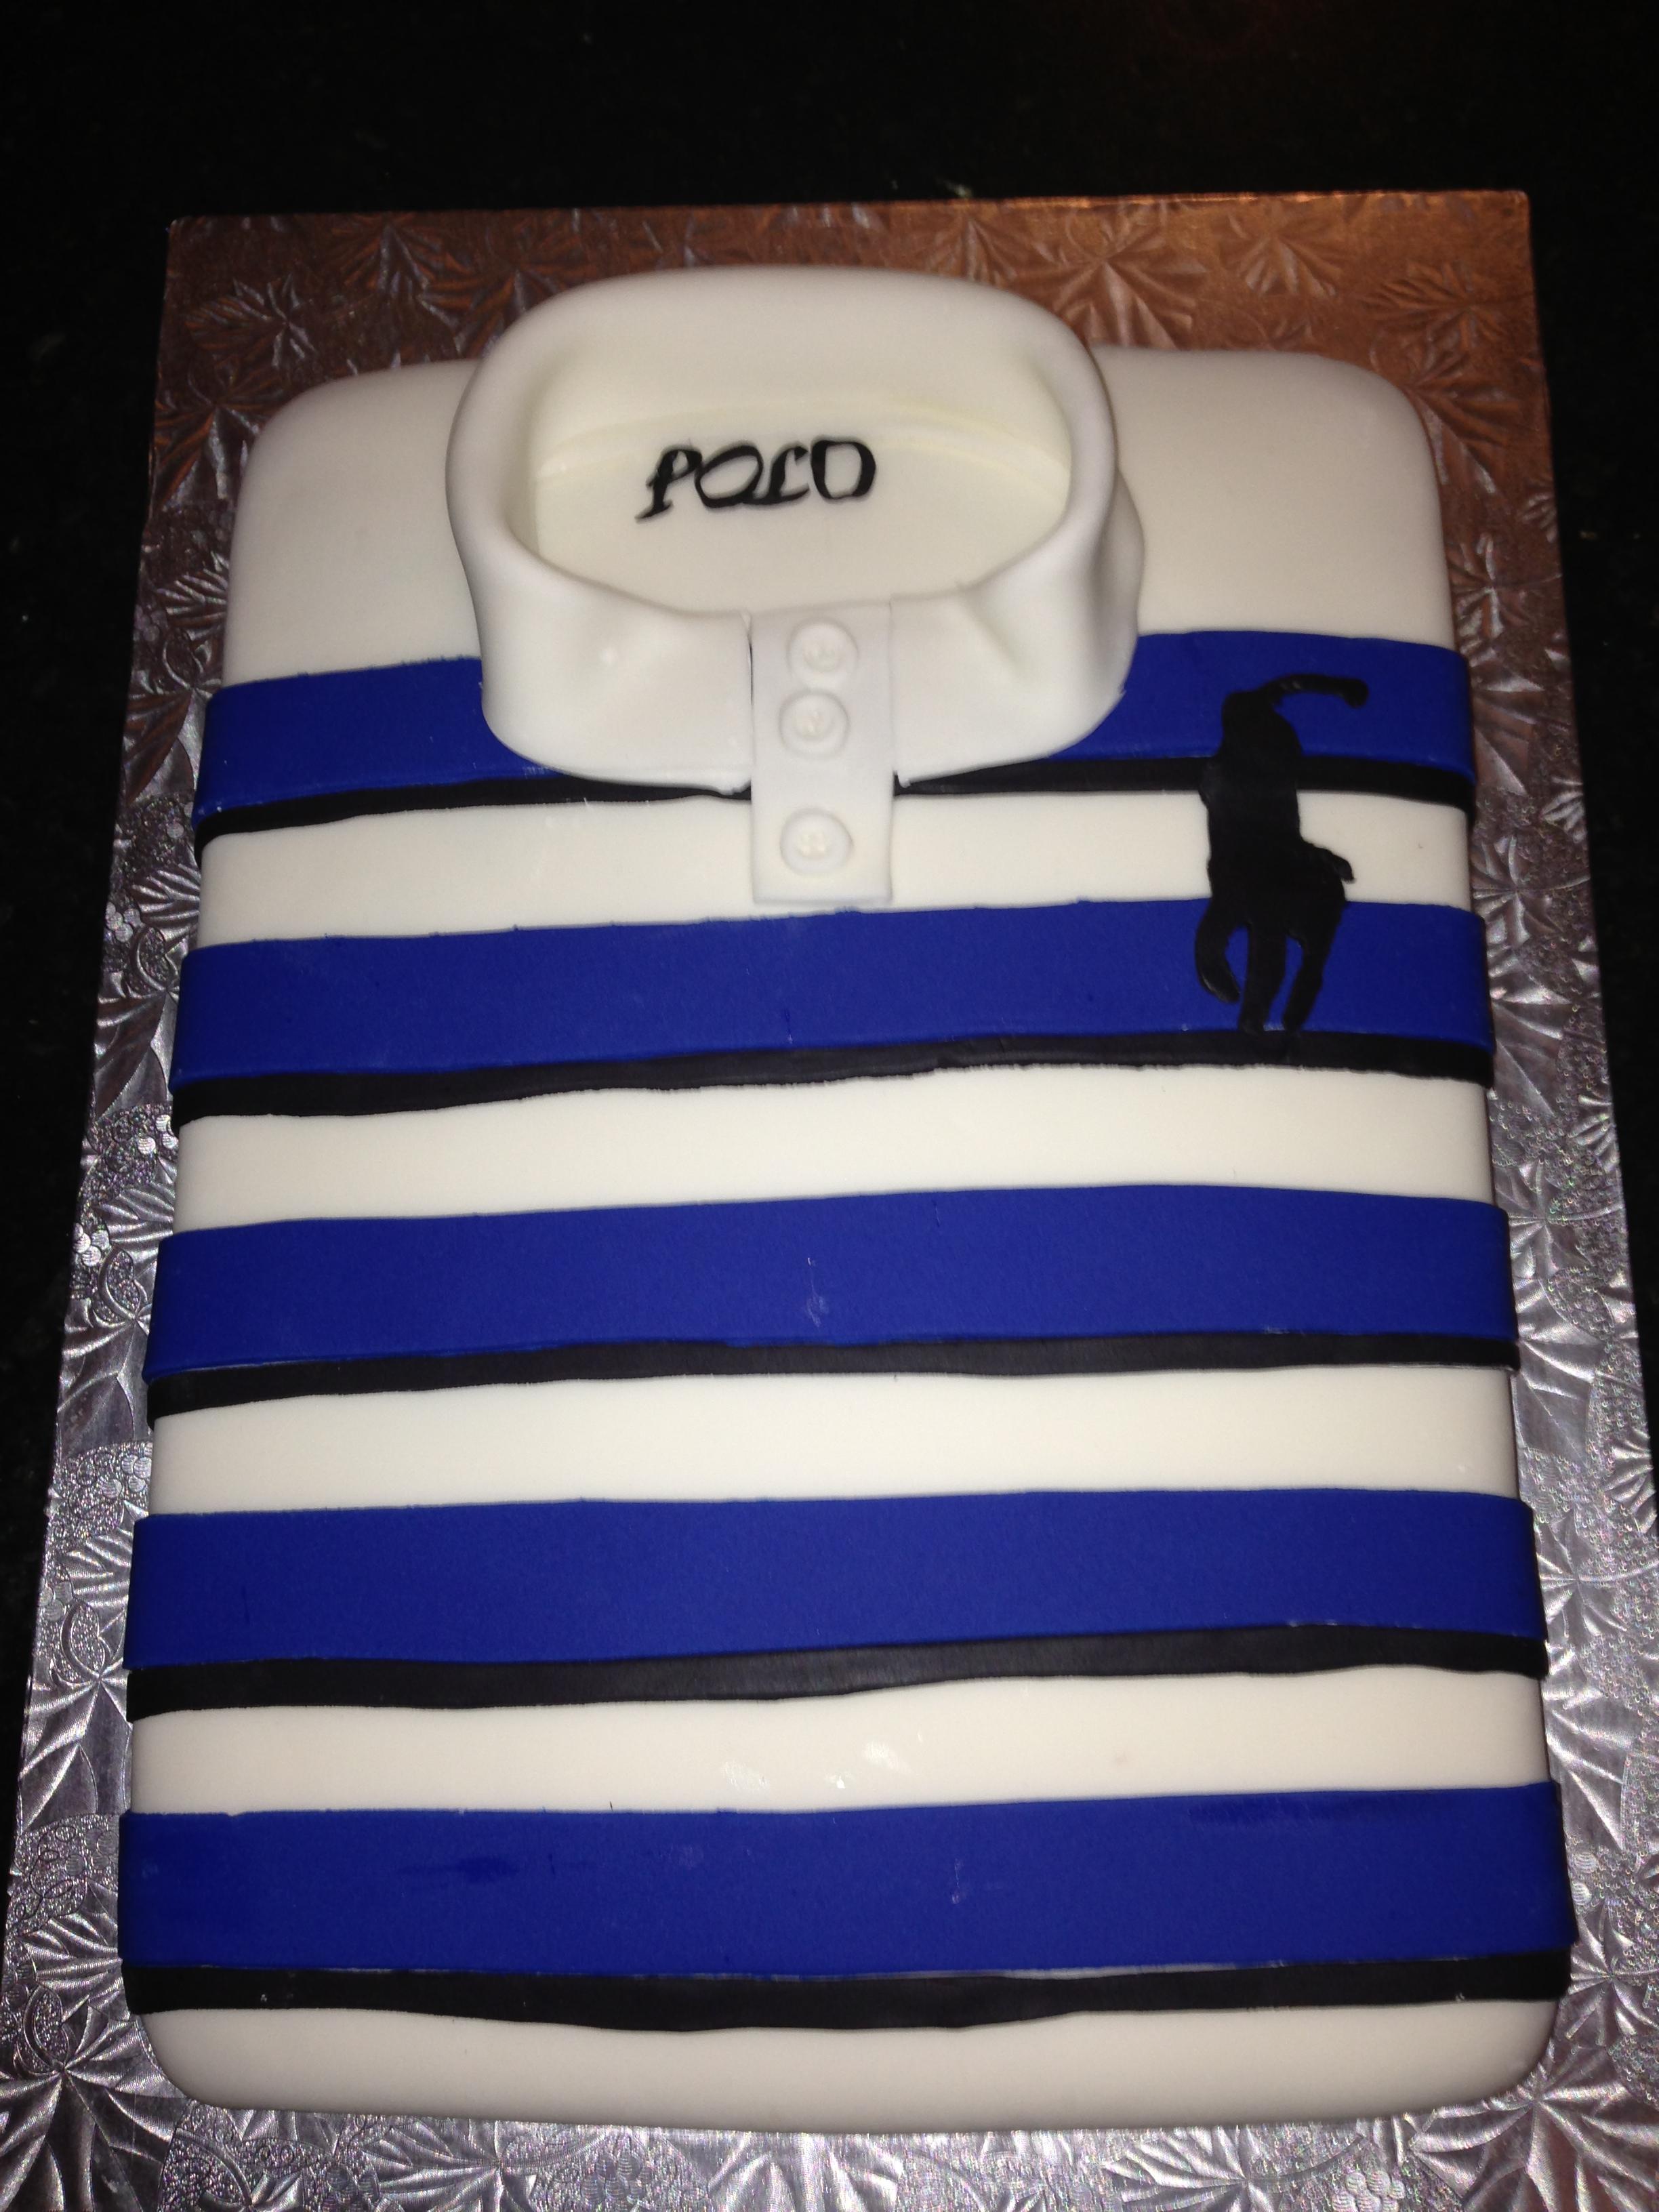 Polo Shirt Cake